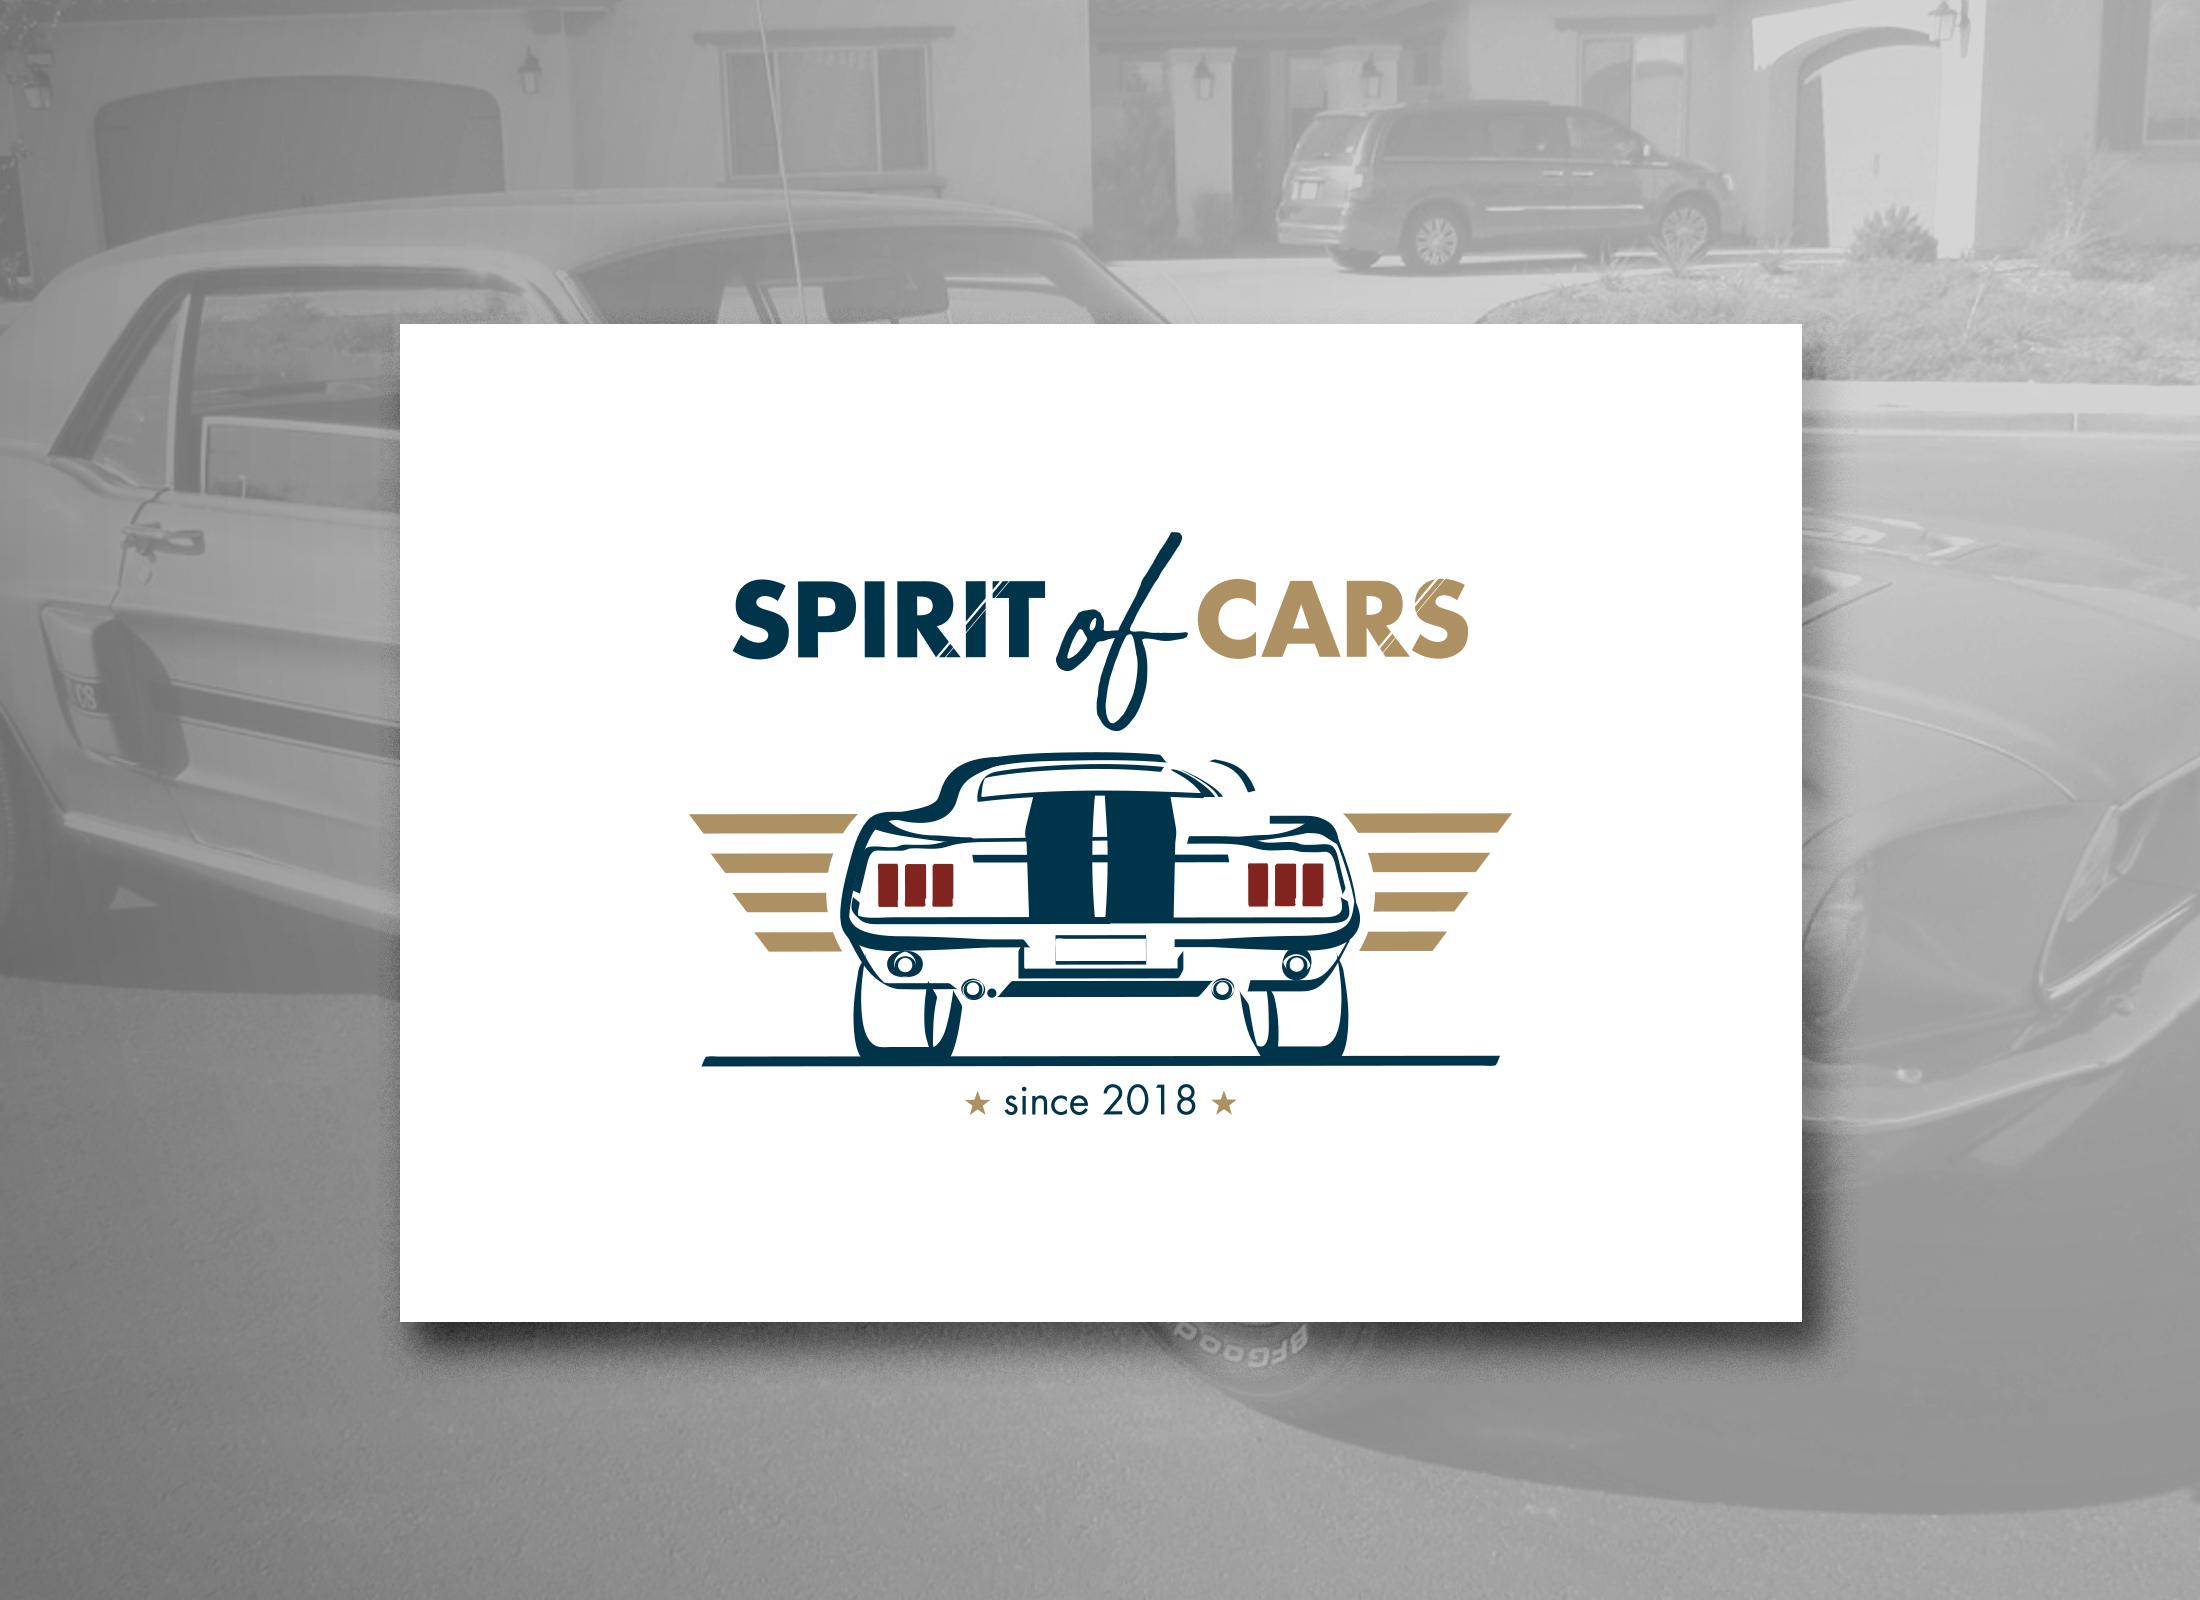 SPIRIT OF CARS